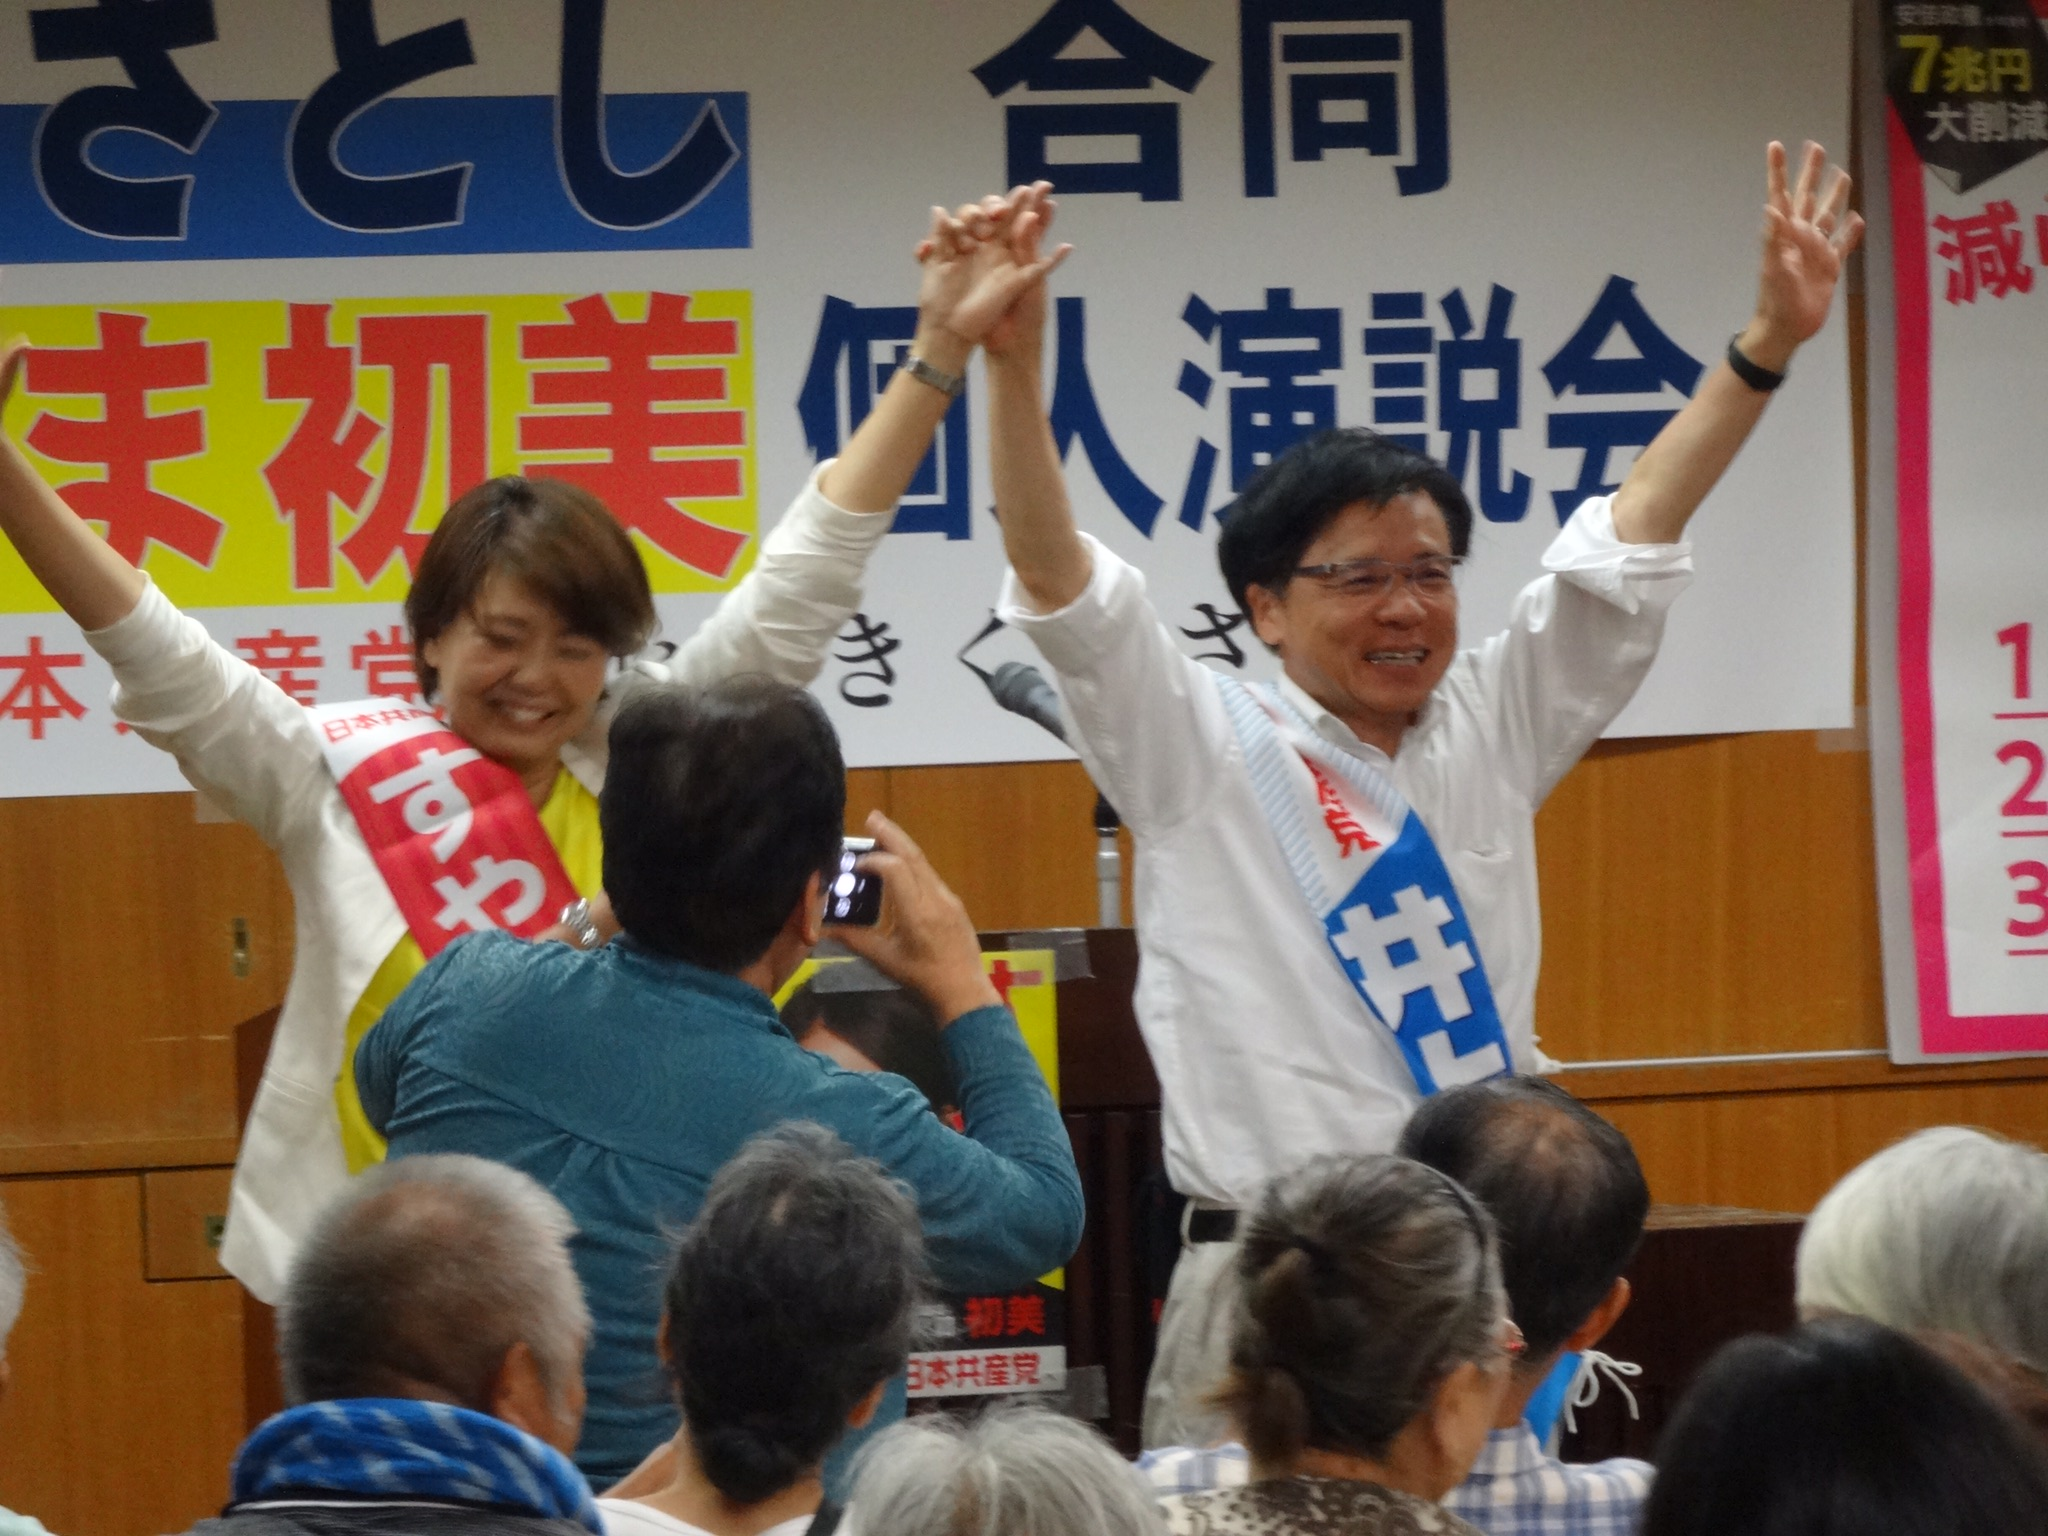 http://www.inoue-satoshi.com/diary/0AFCFFD7-6CF0-47EB-B4DF-CF6F3DC65A39.jpeg